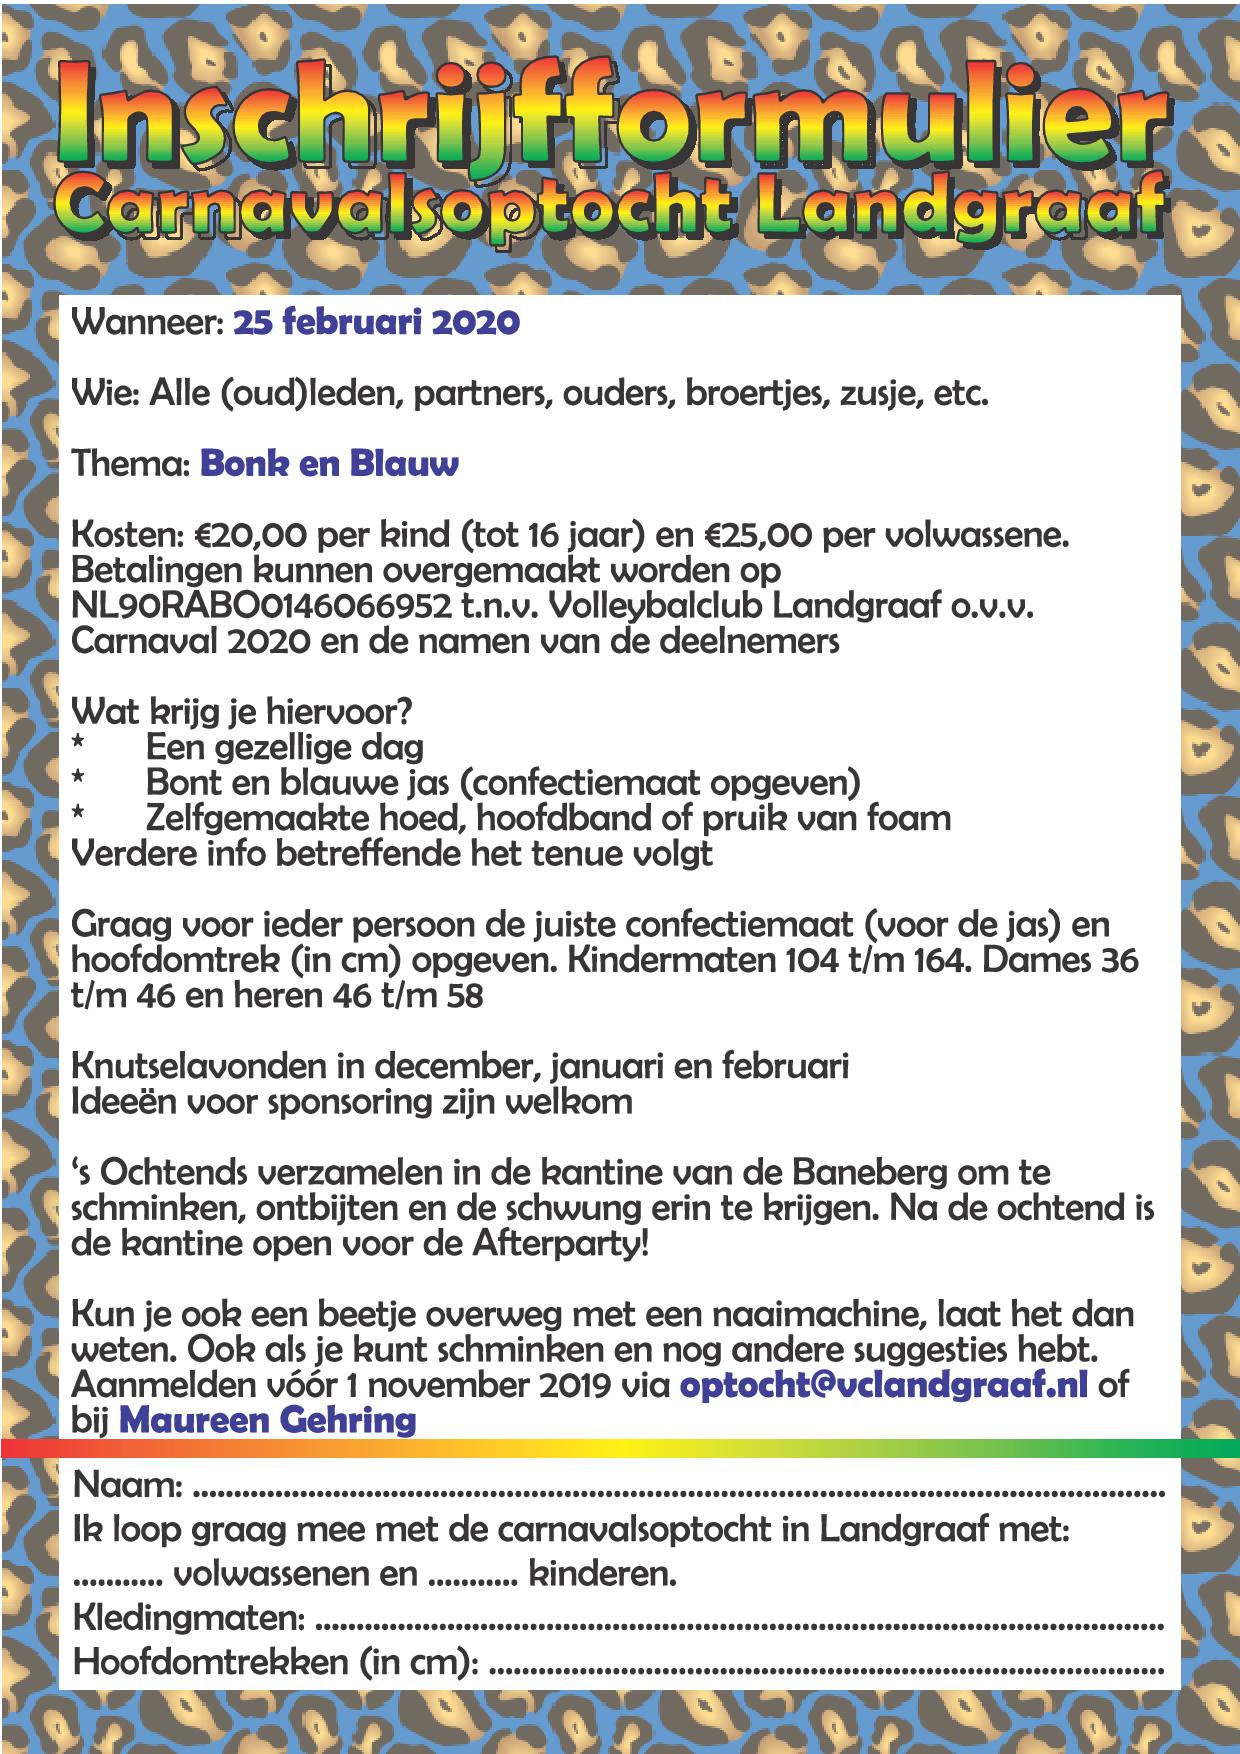 Inschrijfformulier carnaval-2020